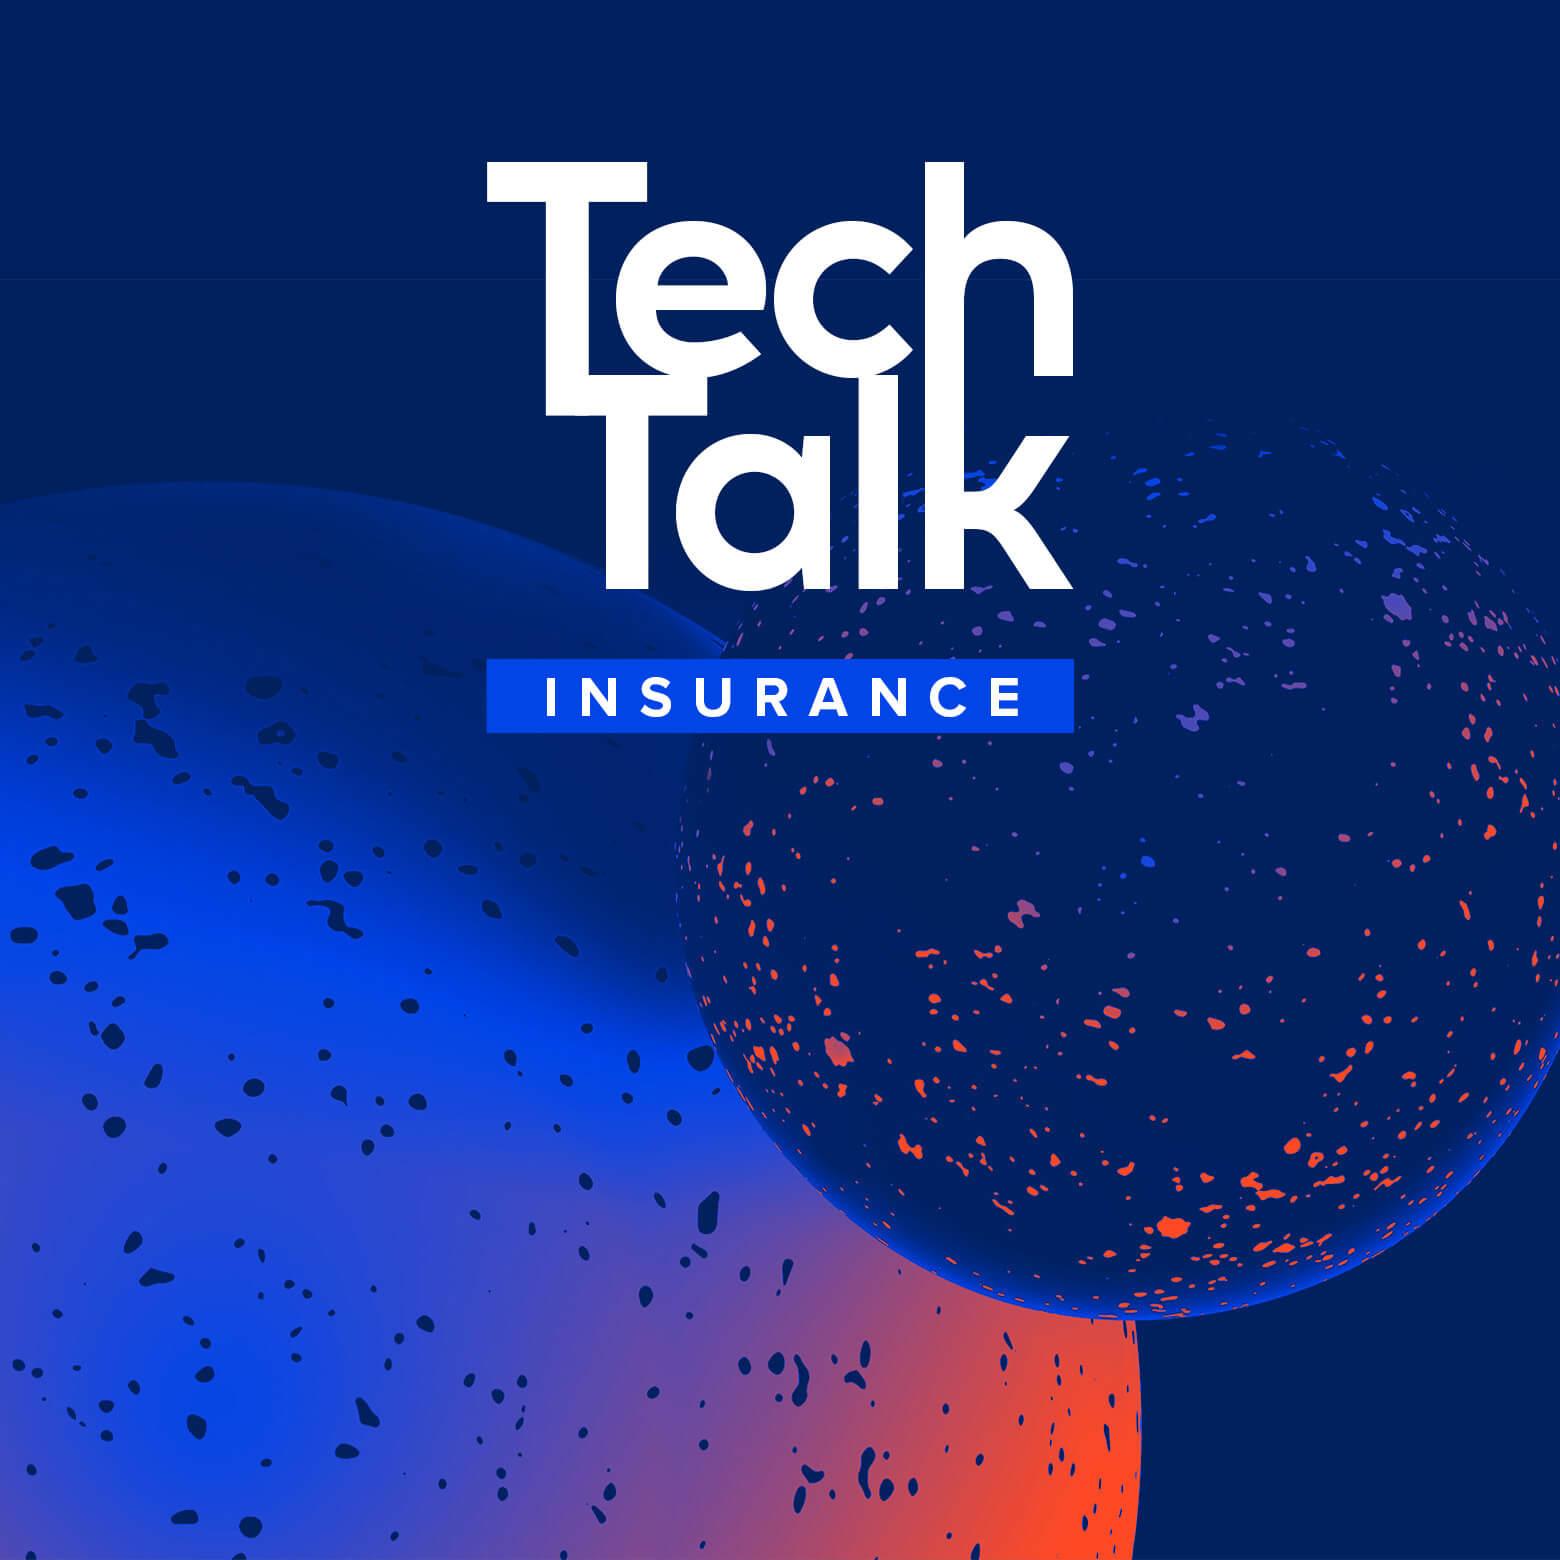 Insurance TechTalk Series